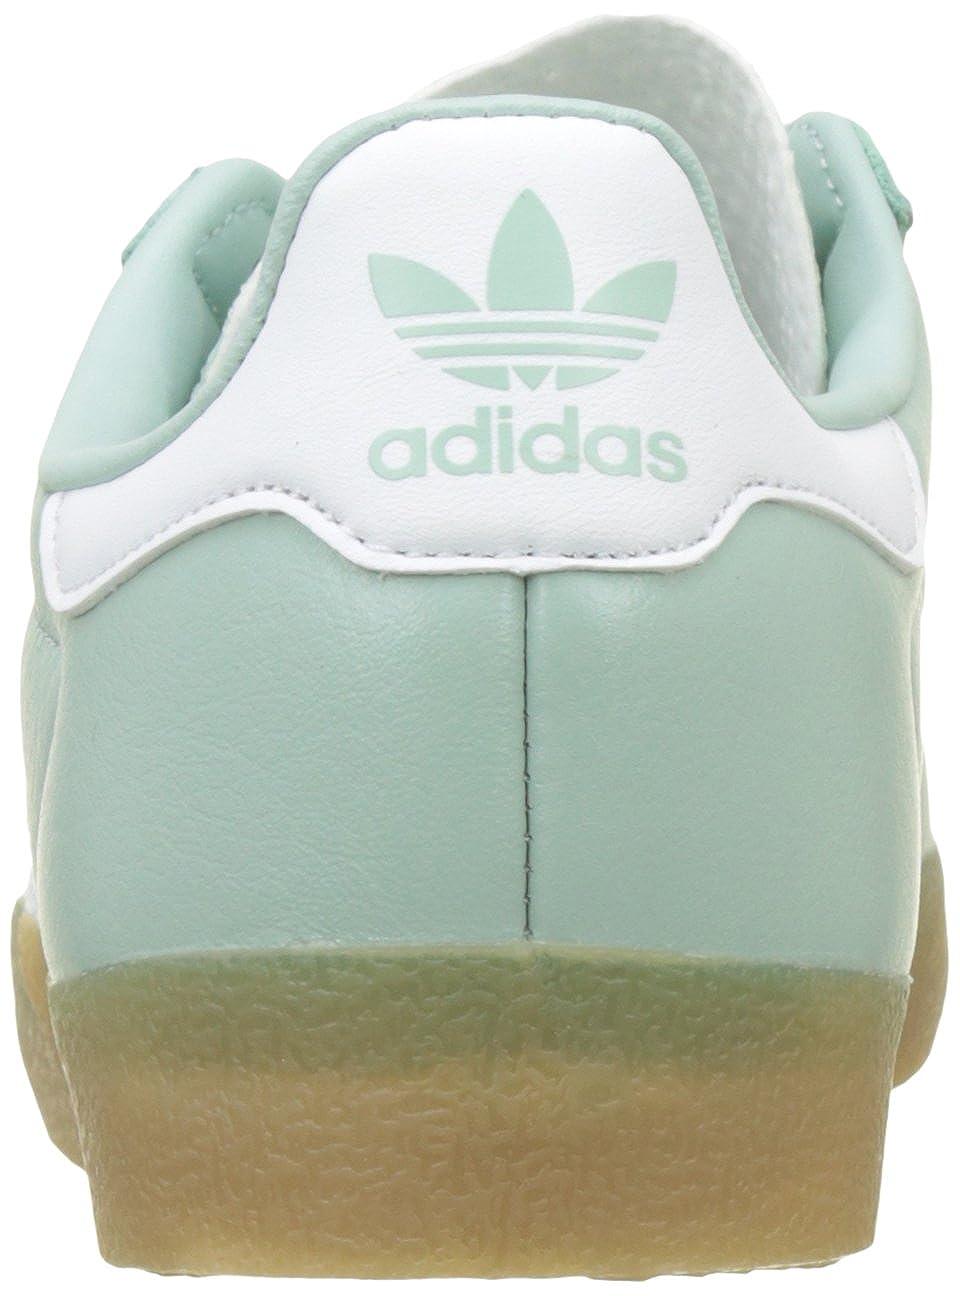 Adidas Damen 350 W Gymnastikschuhe Gymnastikschuhe Gymnastikschuhe grün 9e5ed7